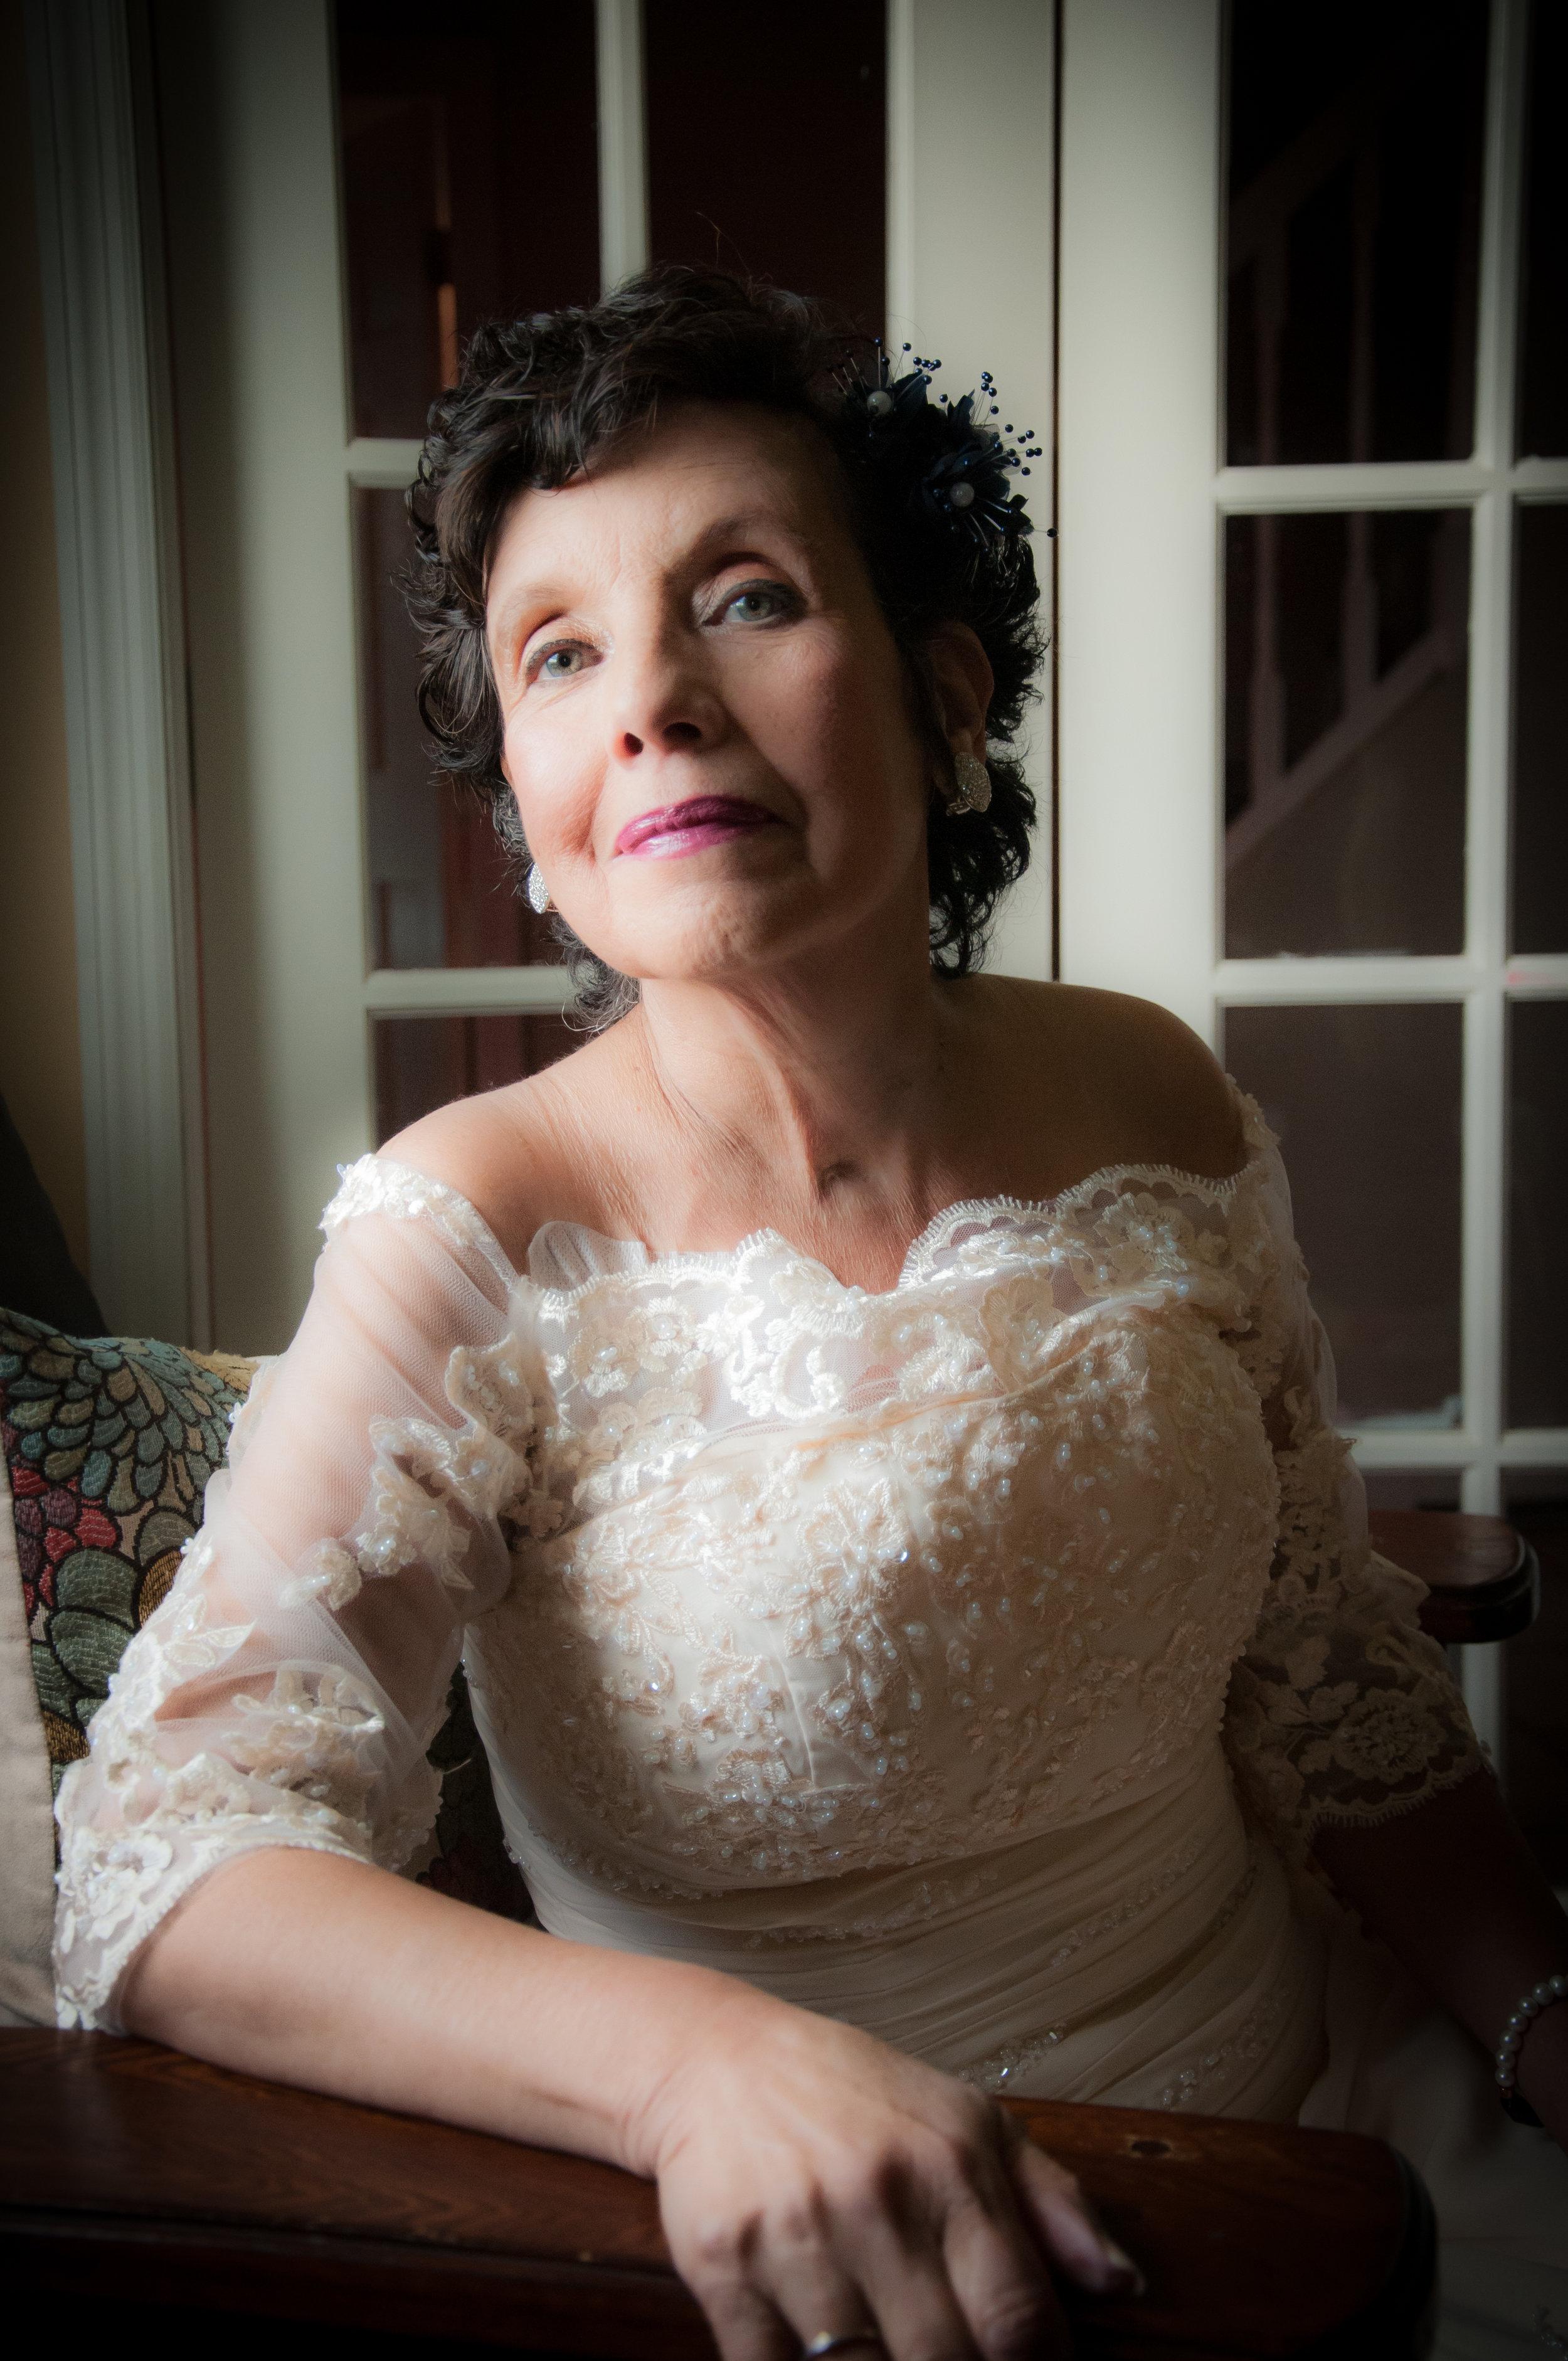 Carrie_Weston_Studios_NY_Wedding_TonandLindaColon-88-2.jpg